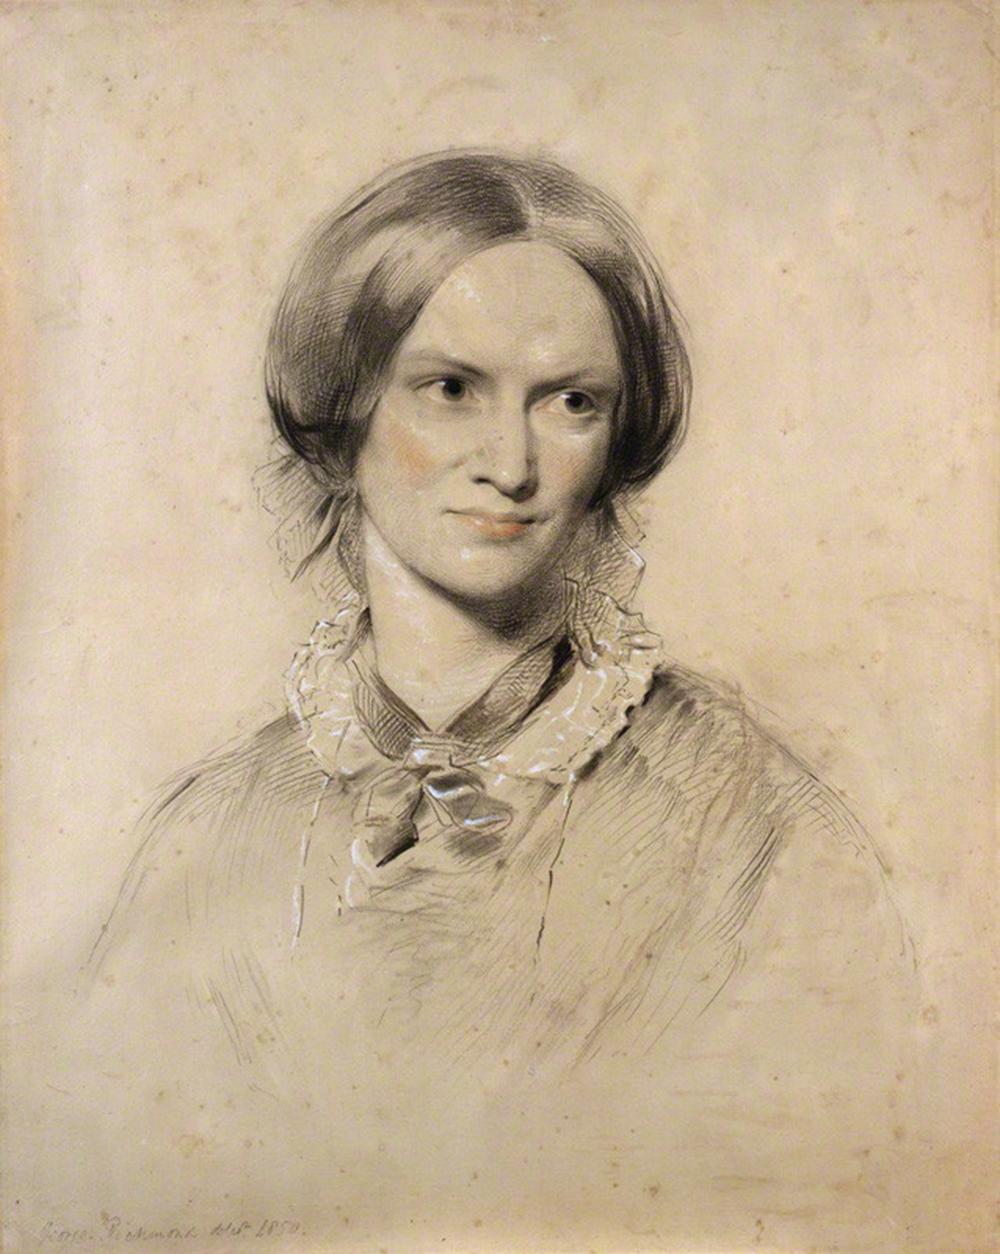 Charlotte Brontë, chalk drawing by George Richmond, 1850. © National Portrait Gallery, London.